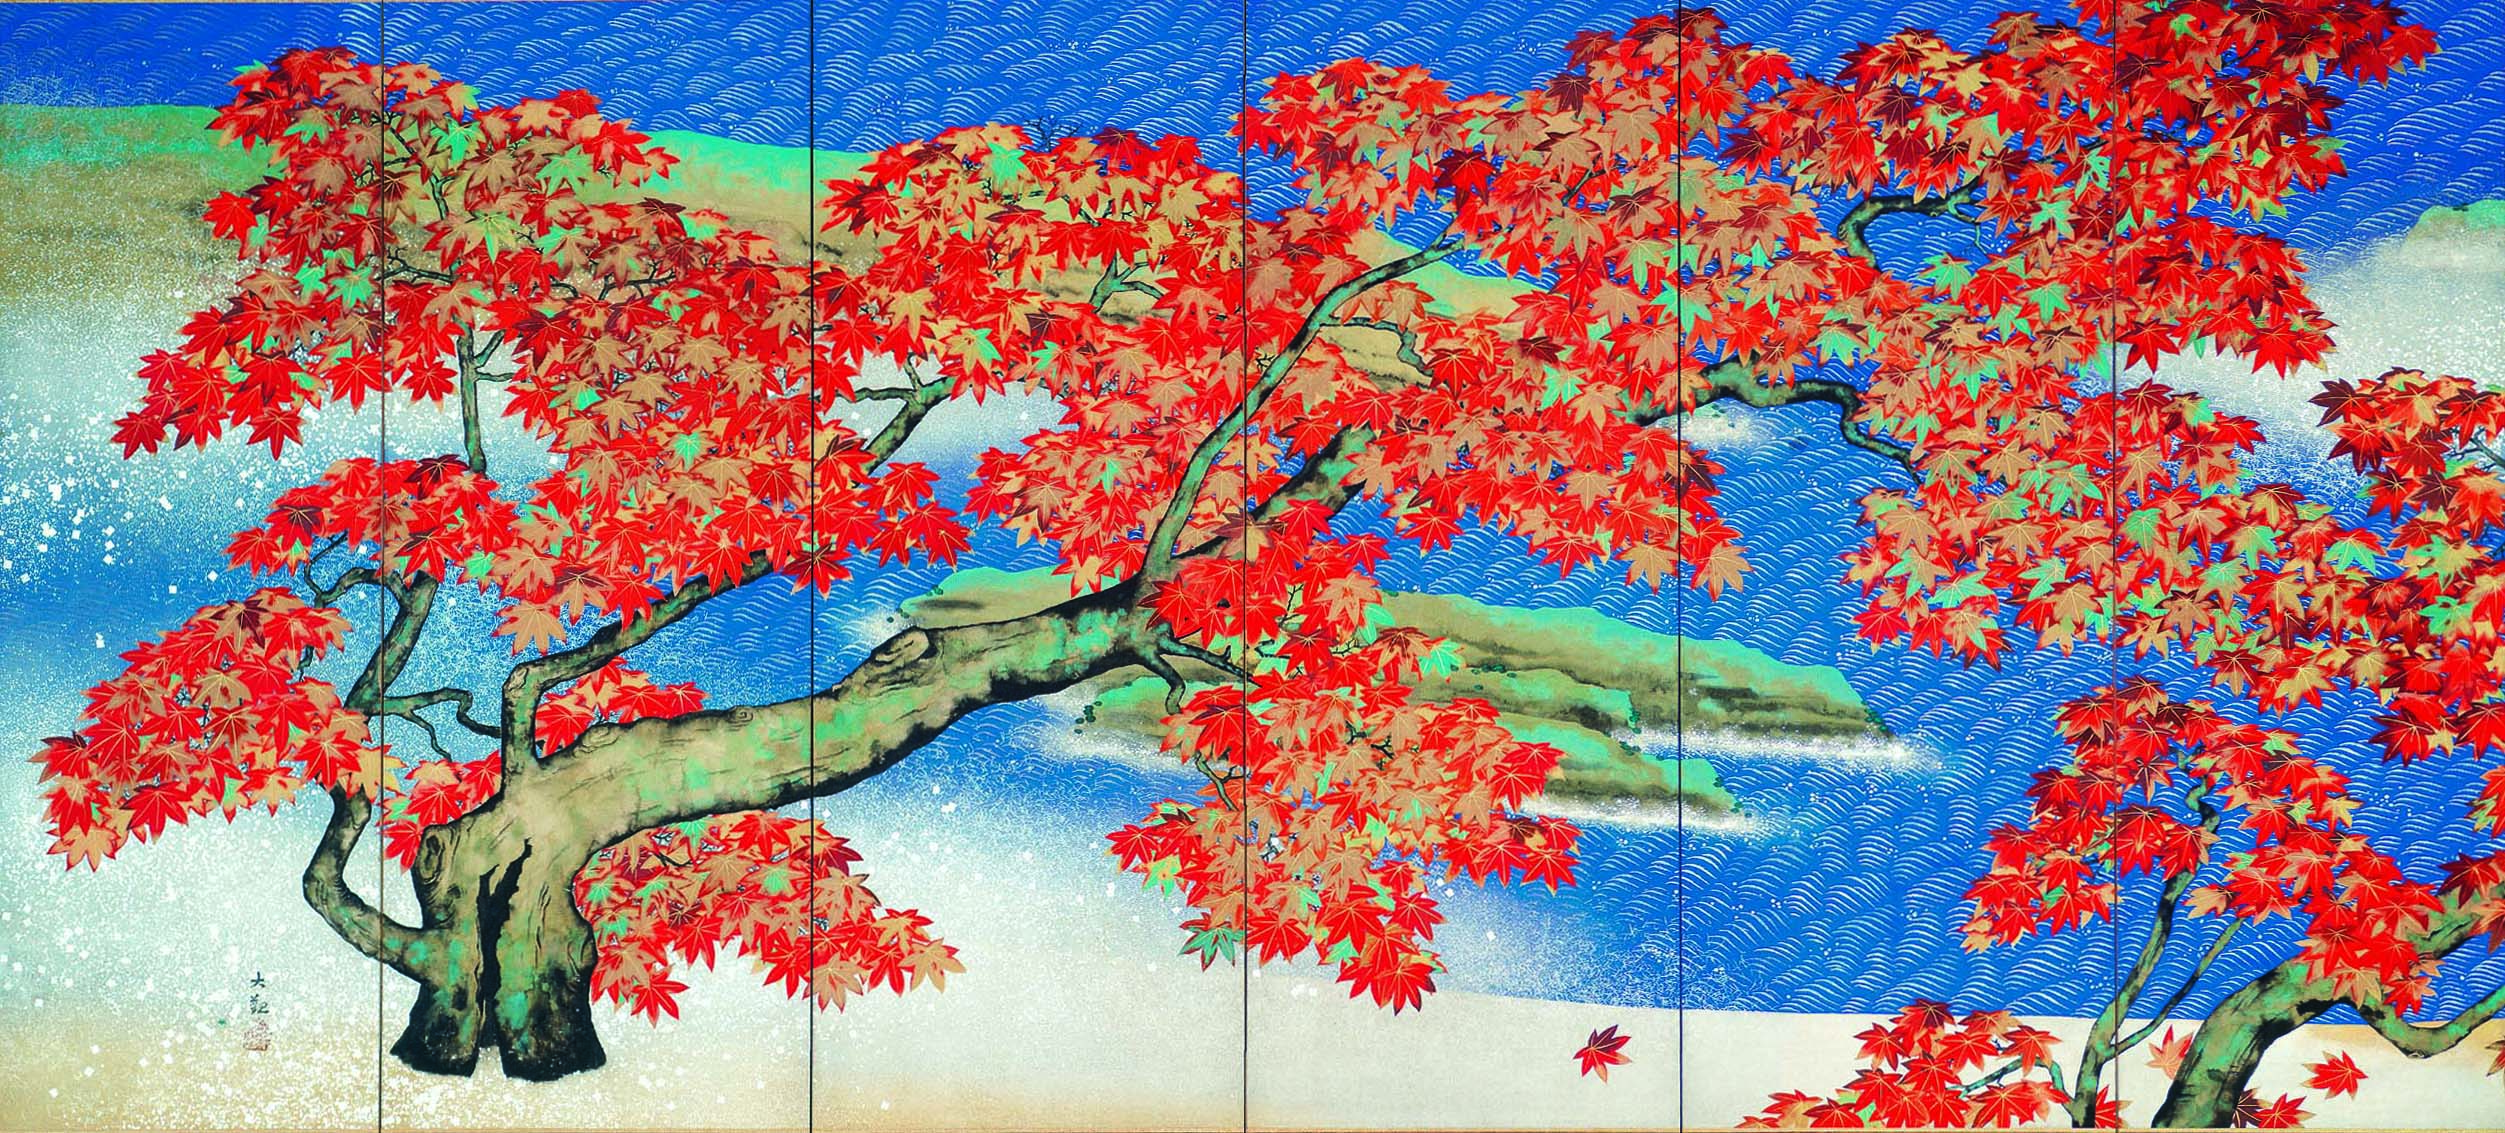 "ADACHI MUSEUM OF ART (c) The Dry Landscape Garden, Yokoyama Taikan ""Autumn Leaves"" (1931)"